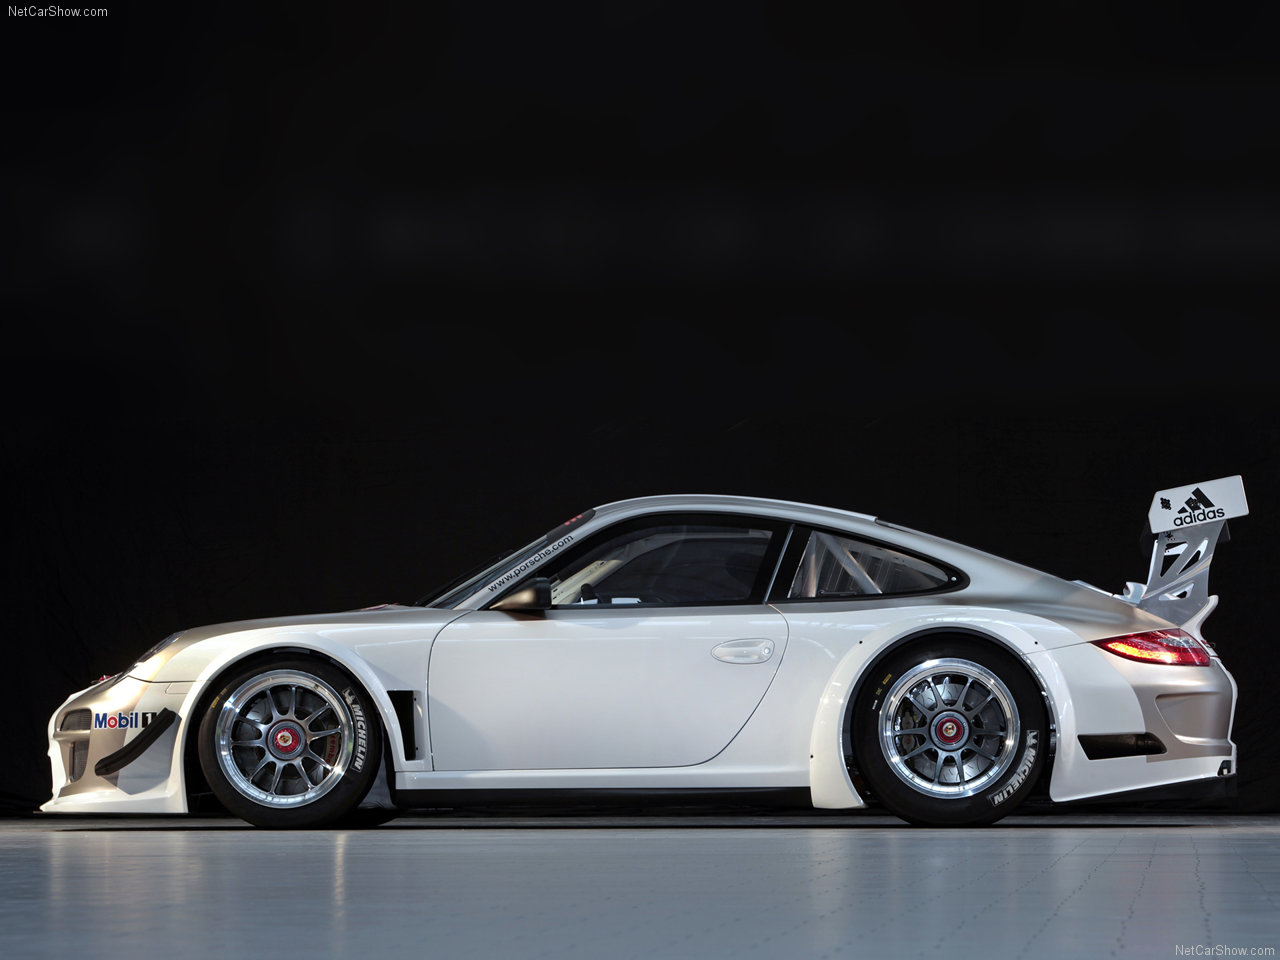 http://1.bp.blogspot.com/-esIOADao8sQ/TYc8yO4XxjI/AAAAAAAACO4/modGXaWi_ww/s1600/Porsche-911_GT3_R_2010_1280x960_wallpaper_02.jpg